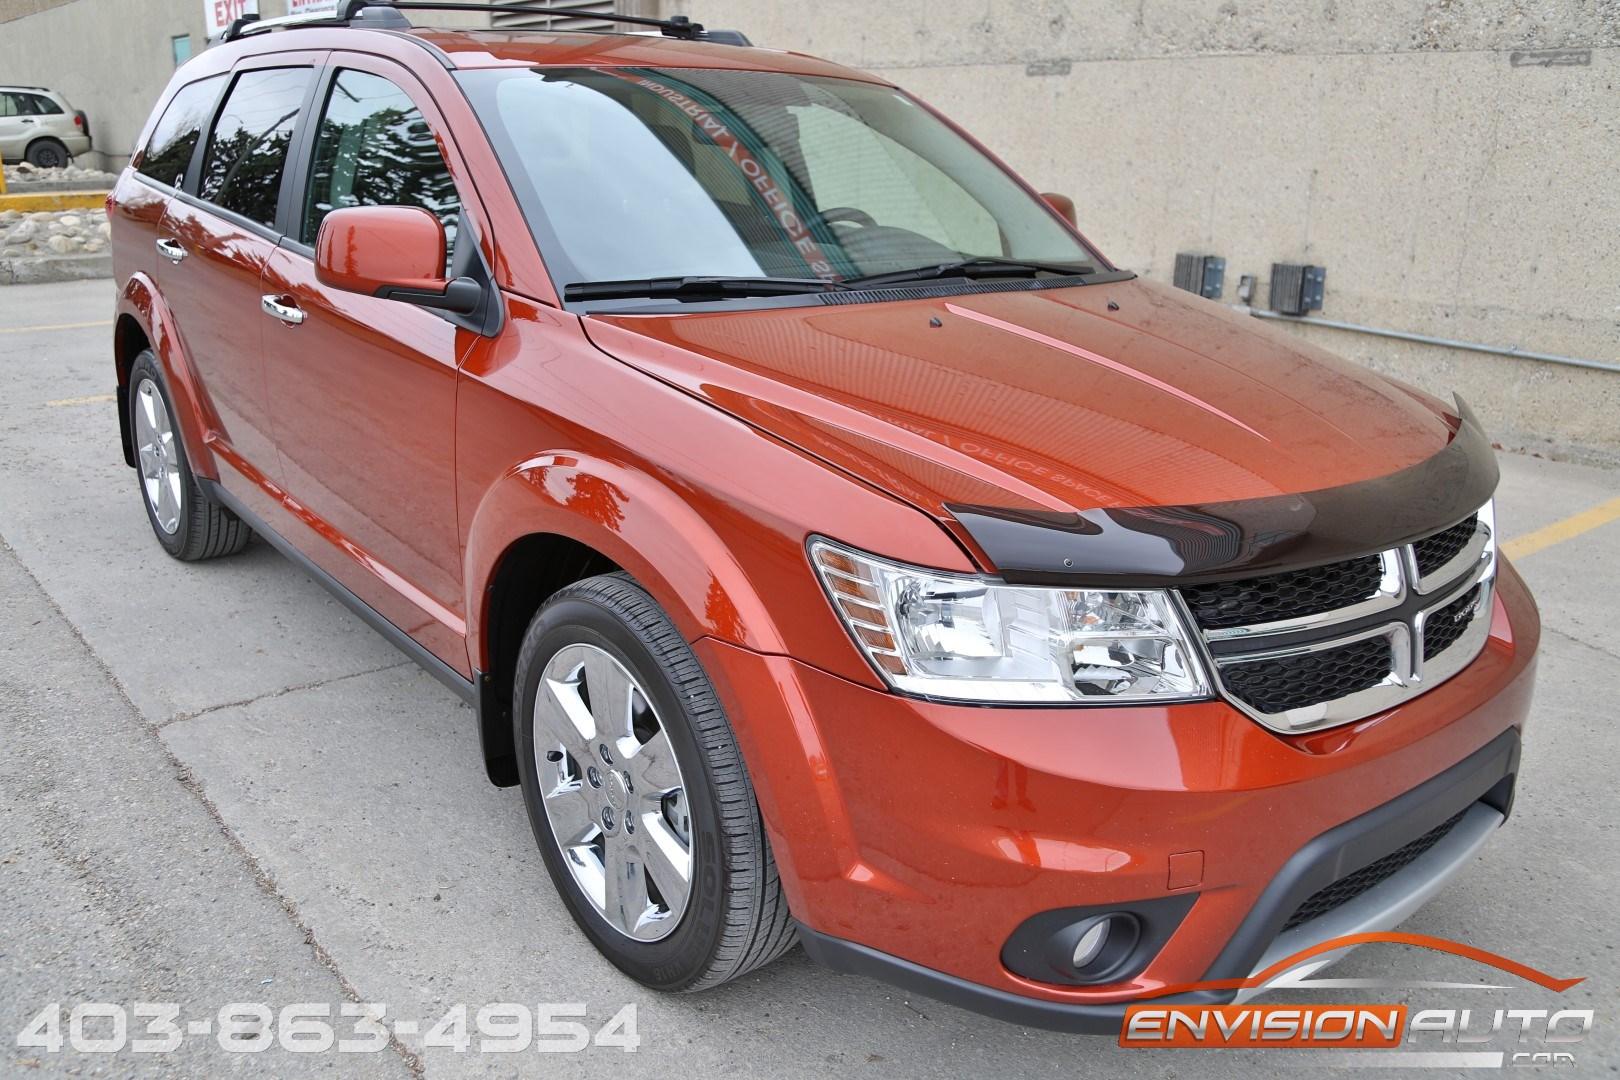 2013 Dodge Journey R T Awd Envision Auto